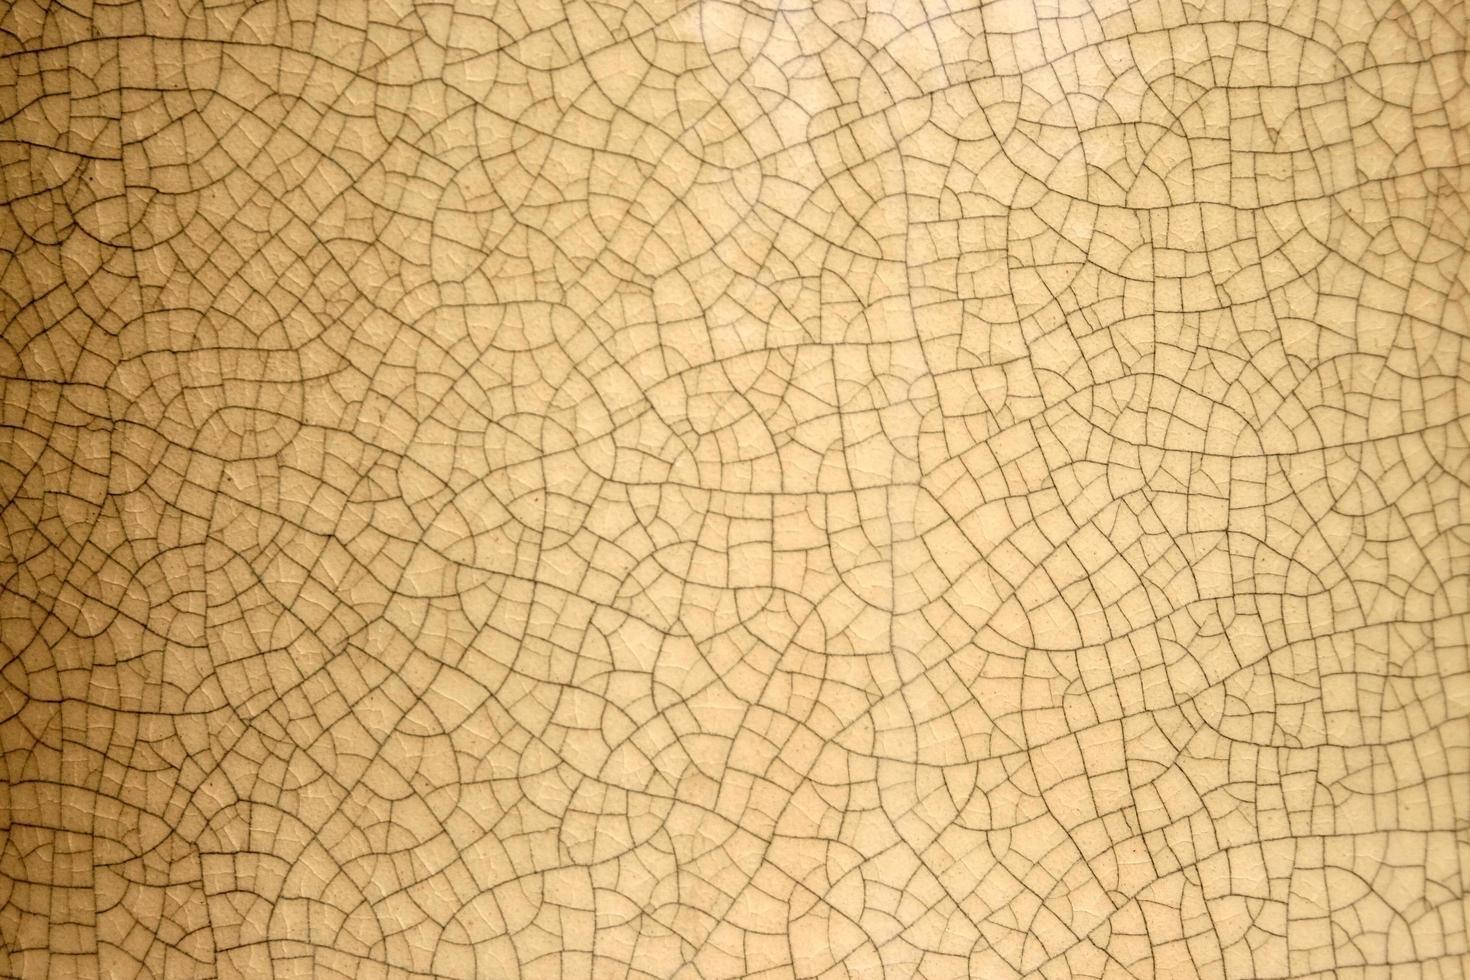 pared marrón agrietada foto